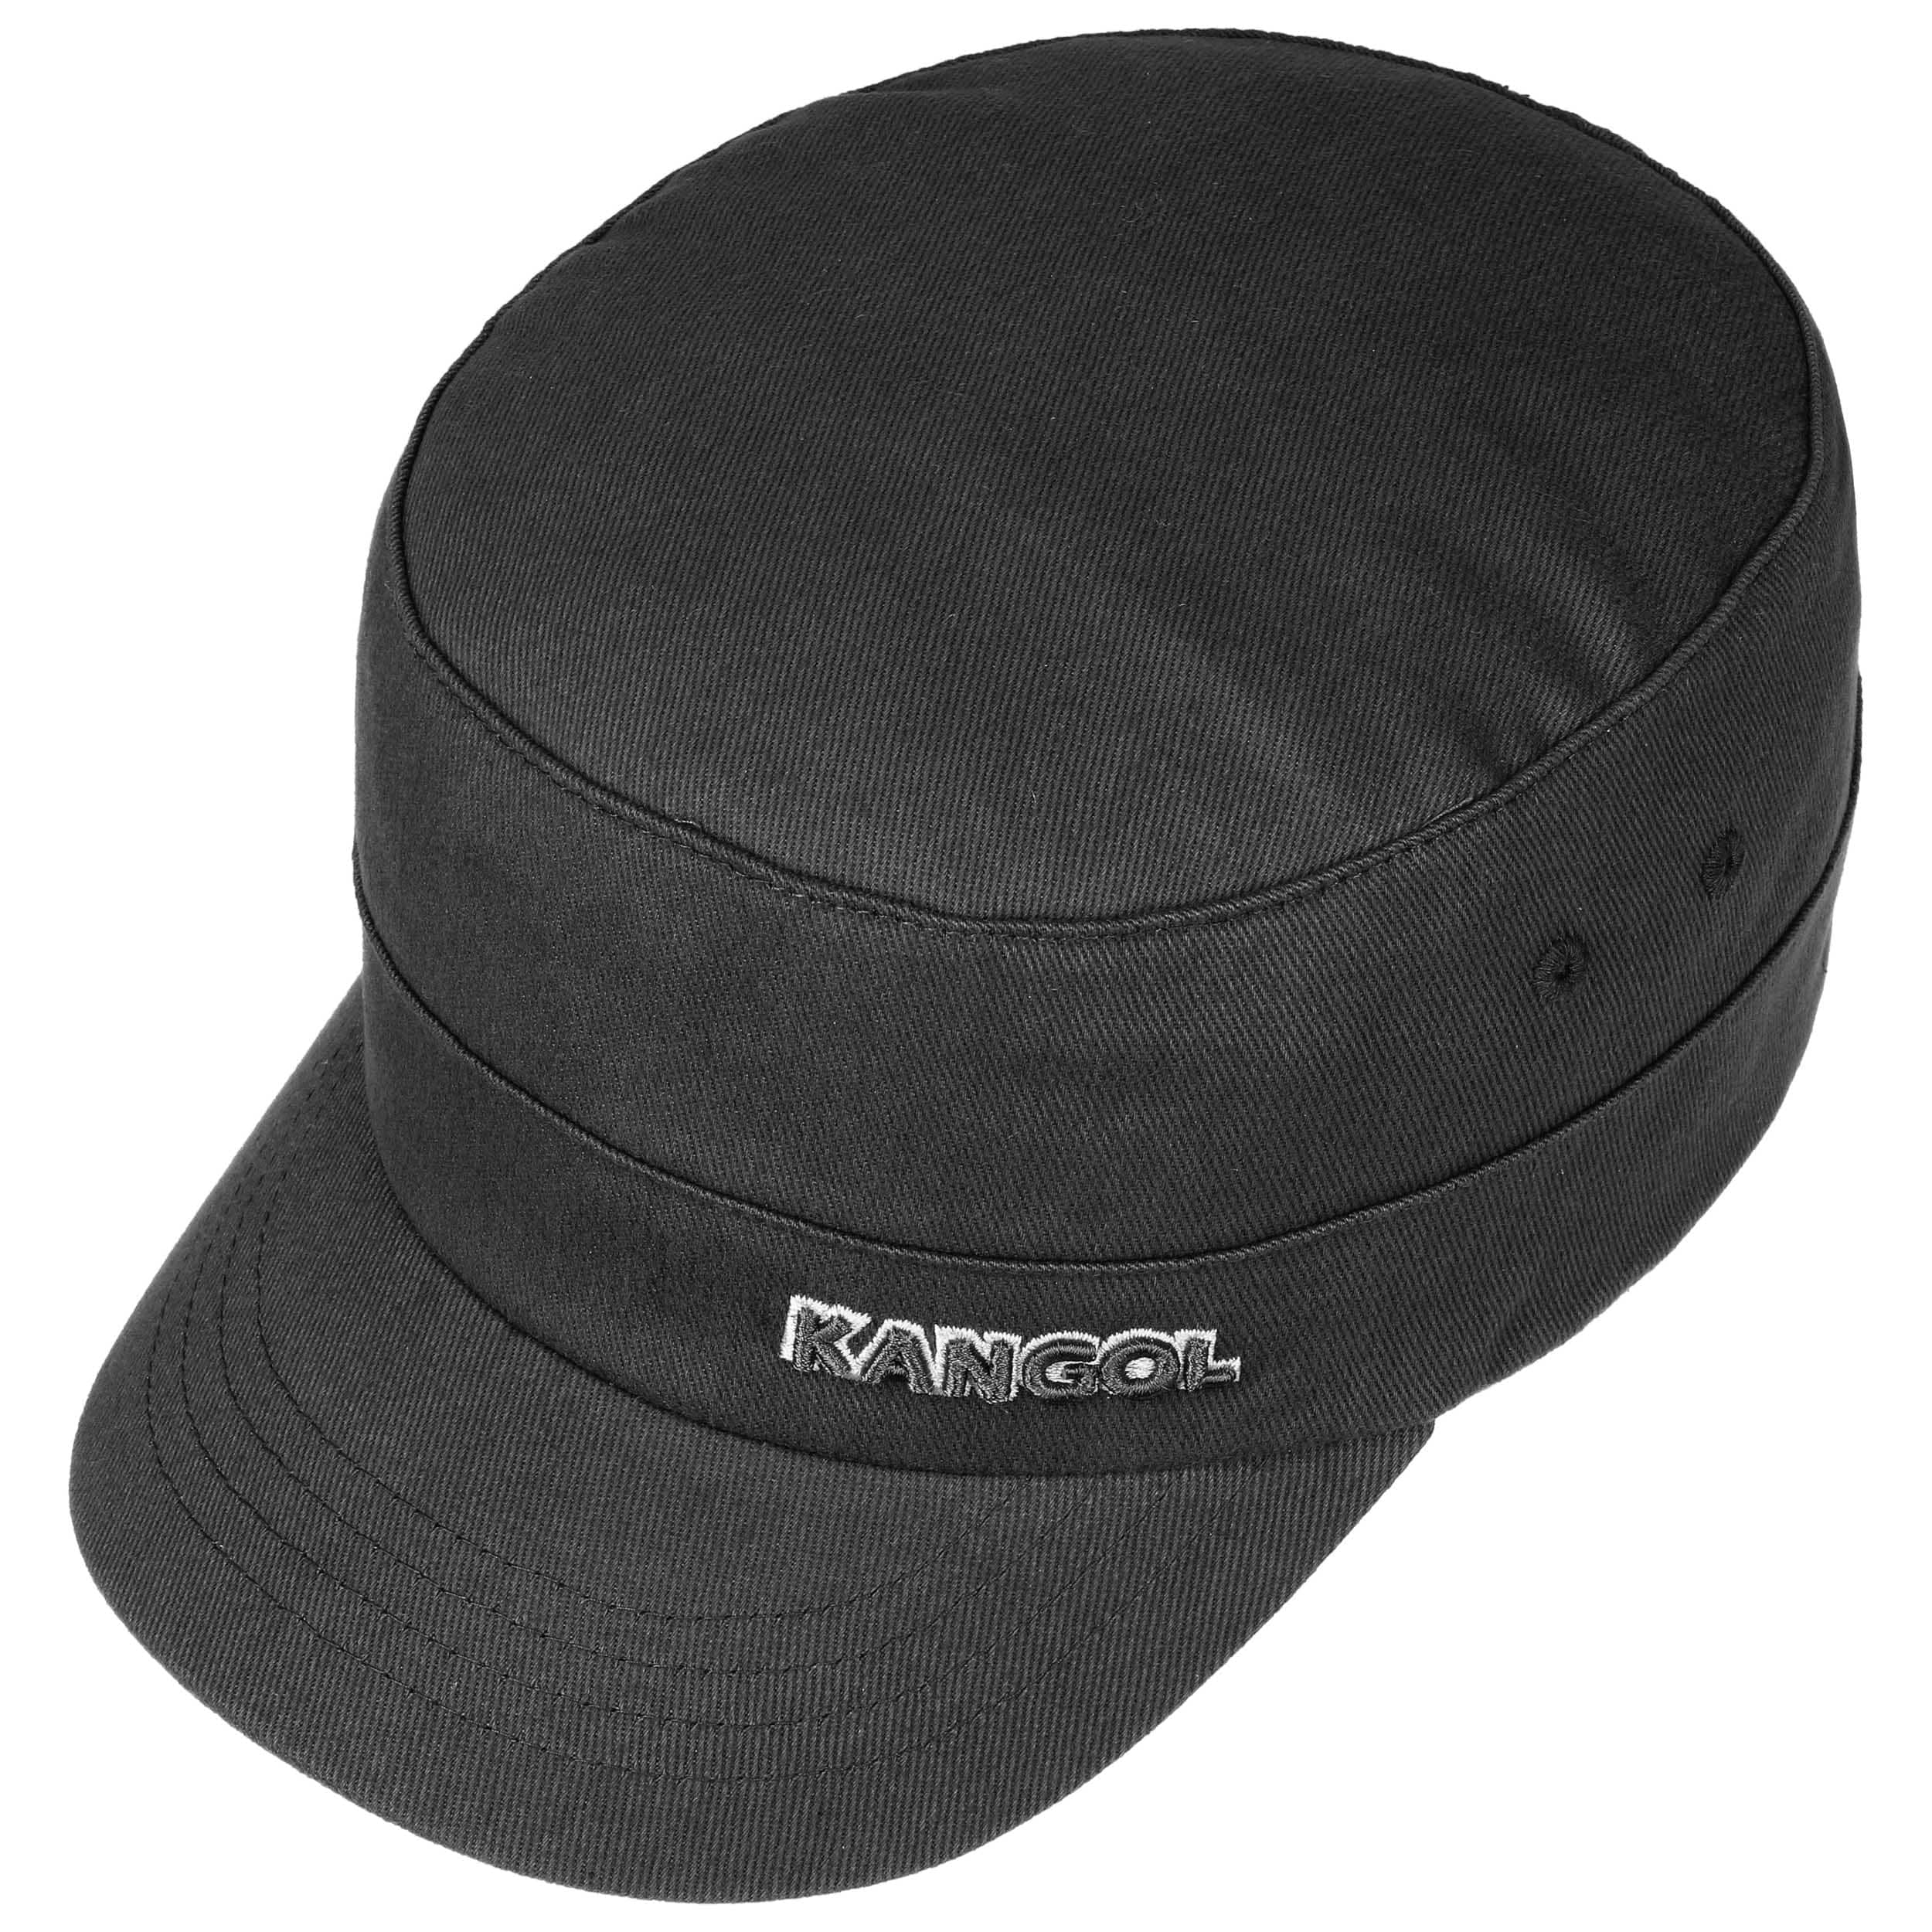 kangol flexfit urban army cap eur 4200 gt hats caps